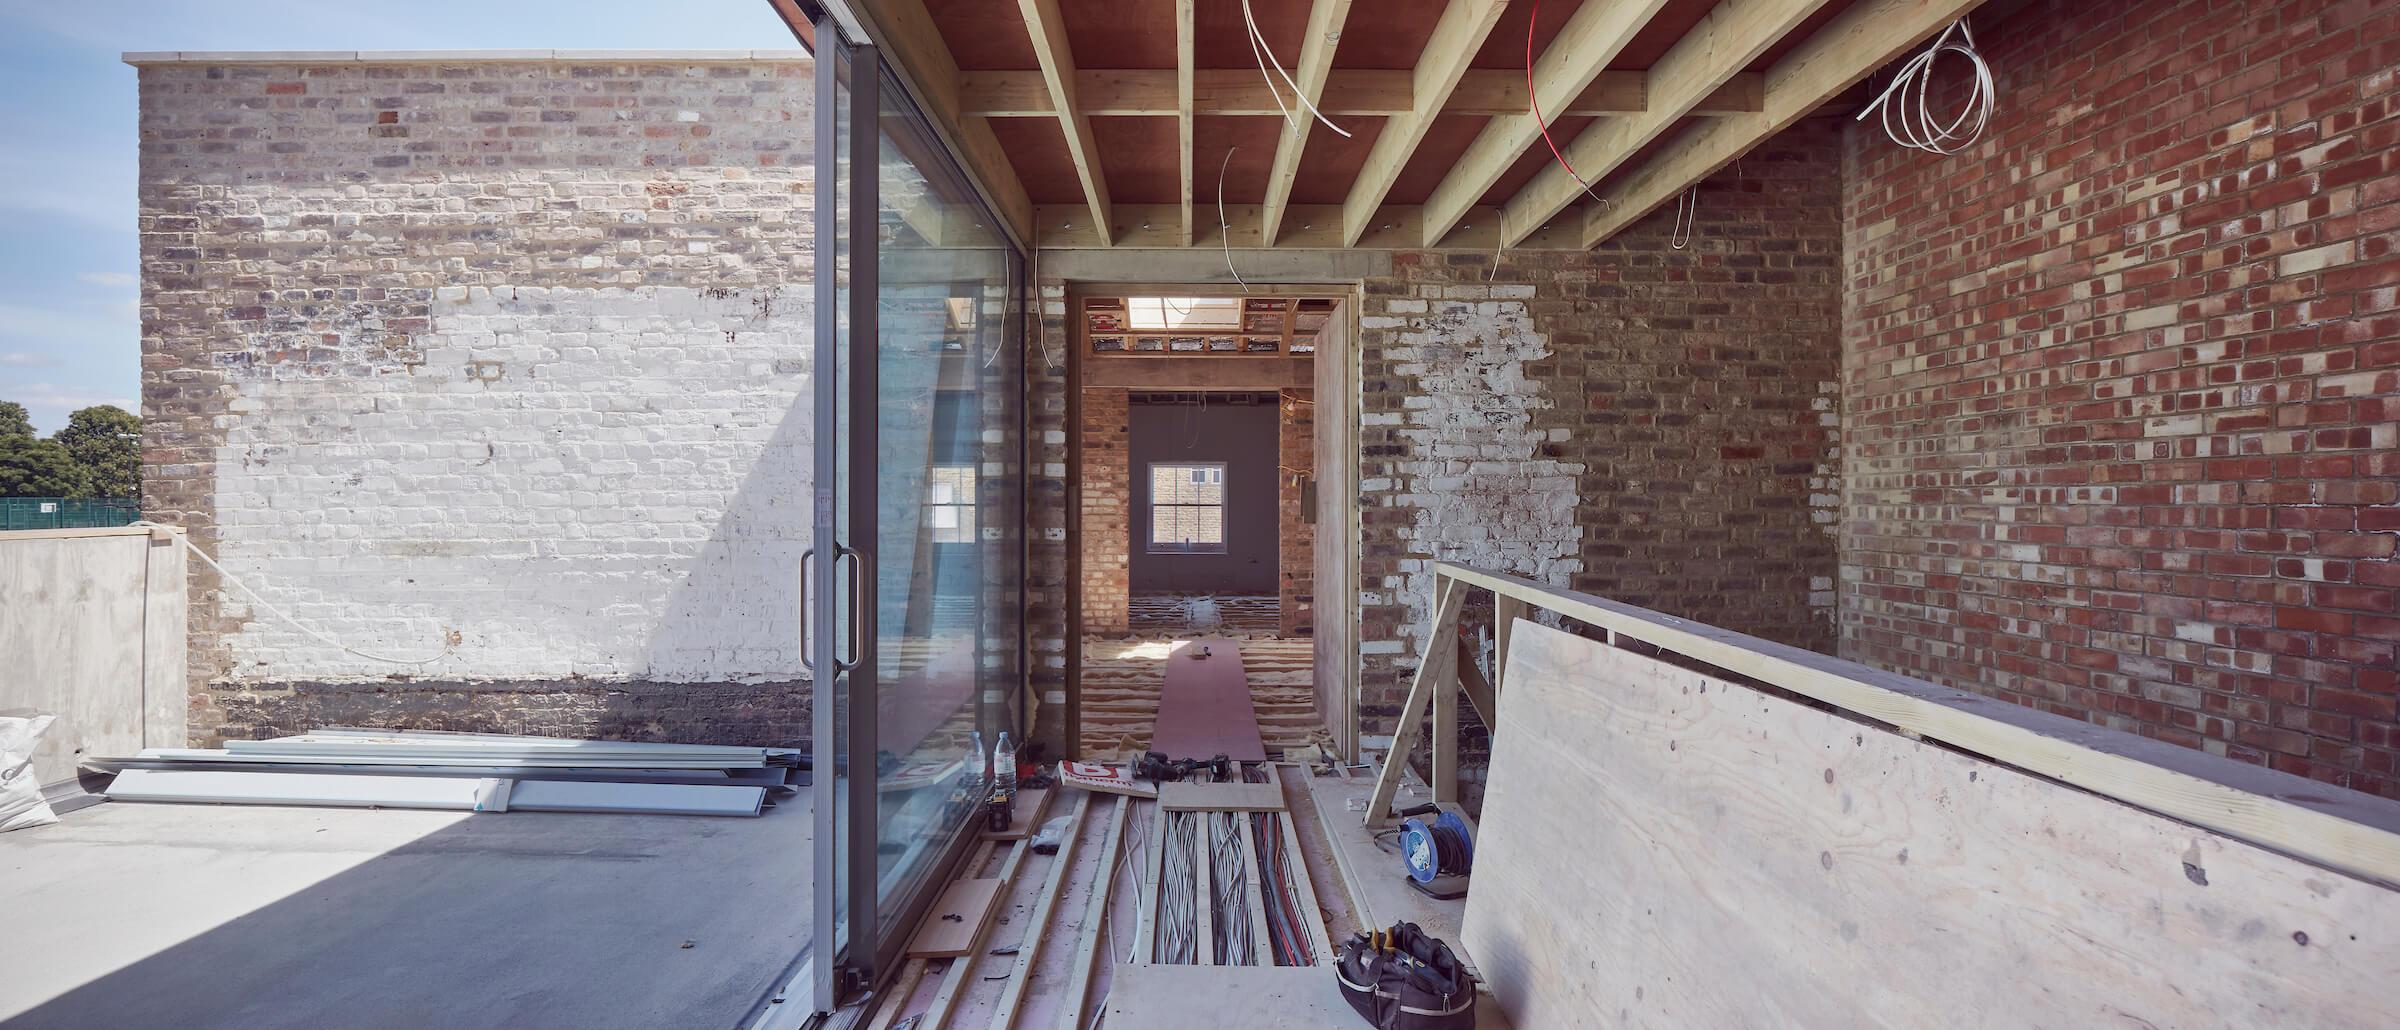 Pearson Lloyd – Yorkton Street Studio, East London, 2020.